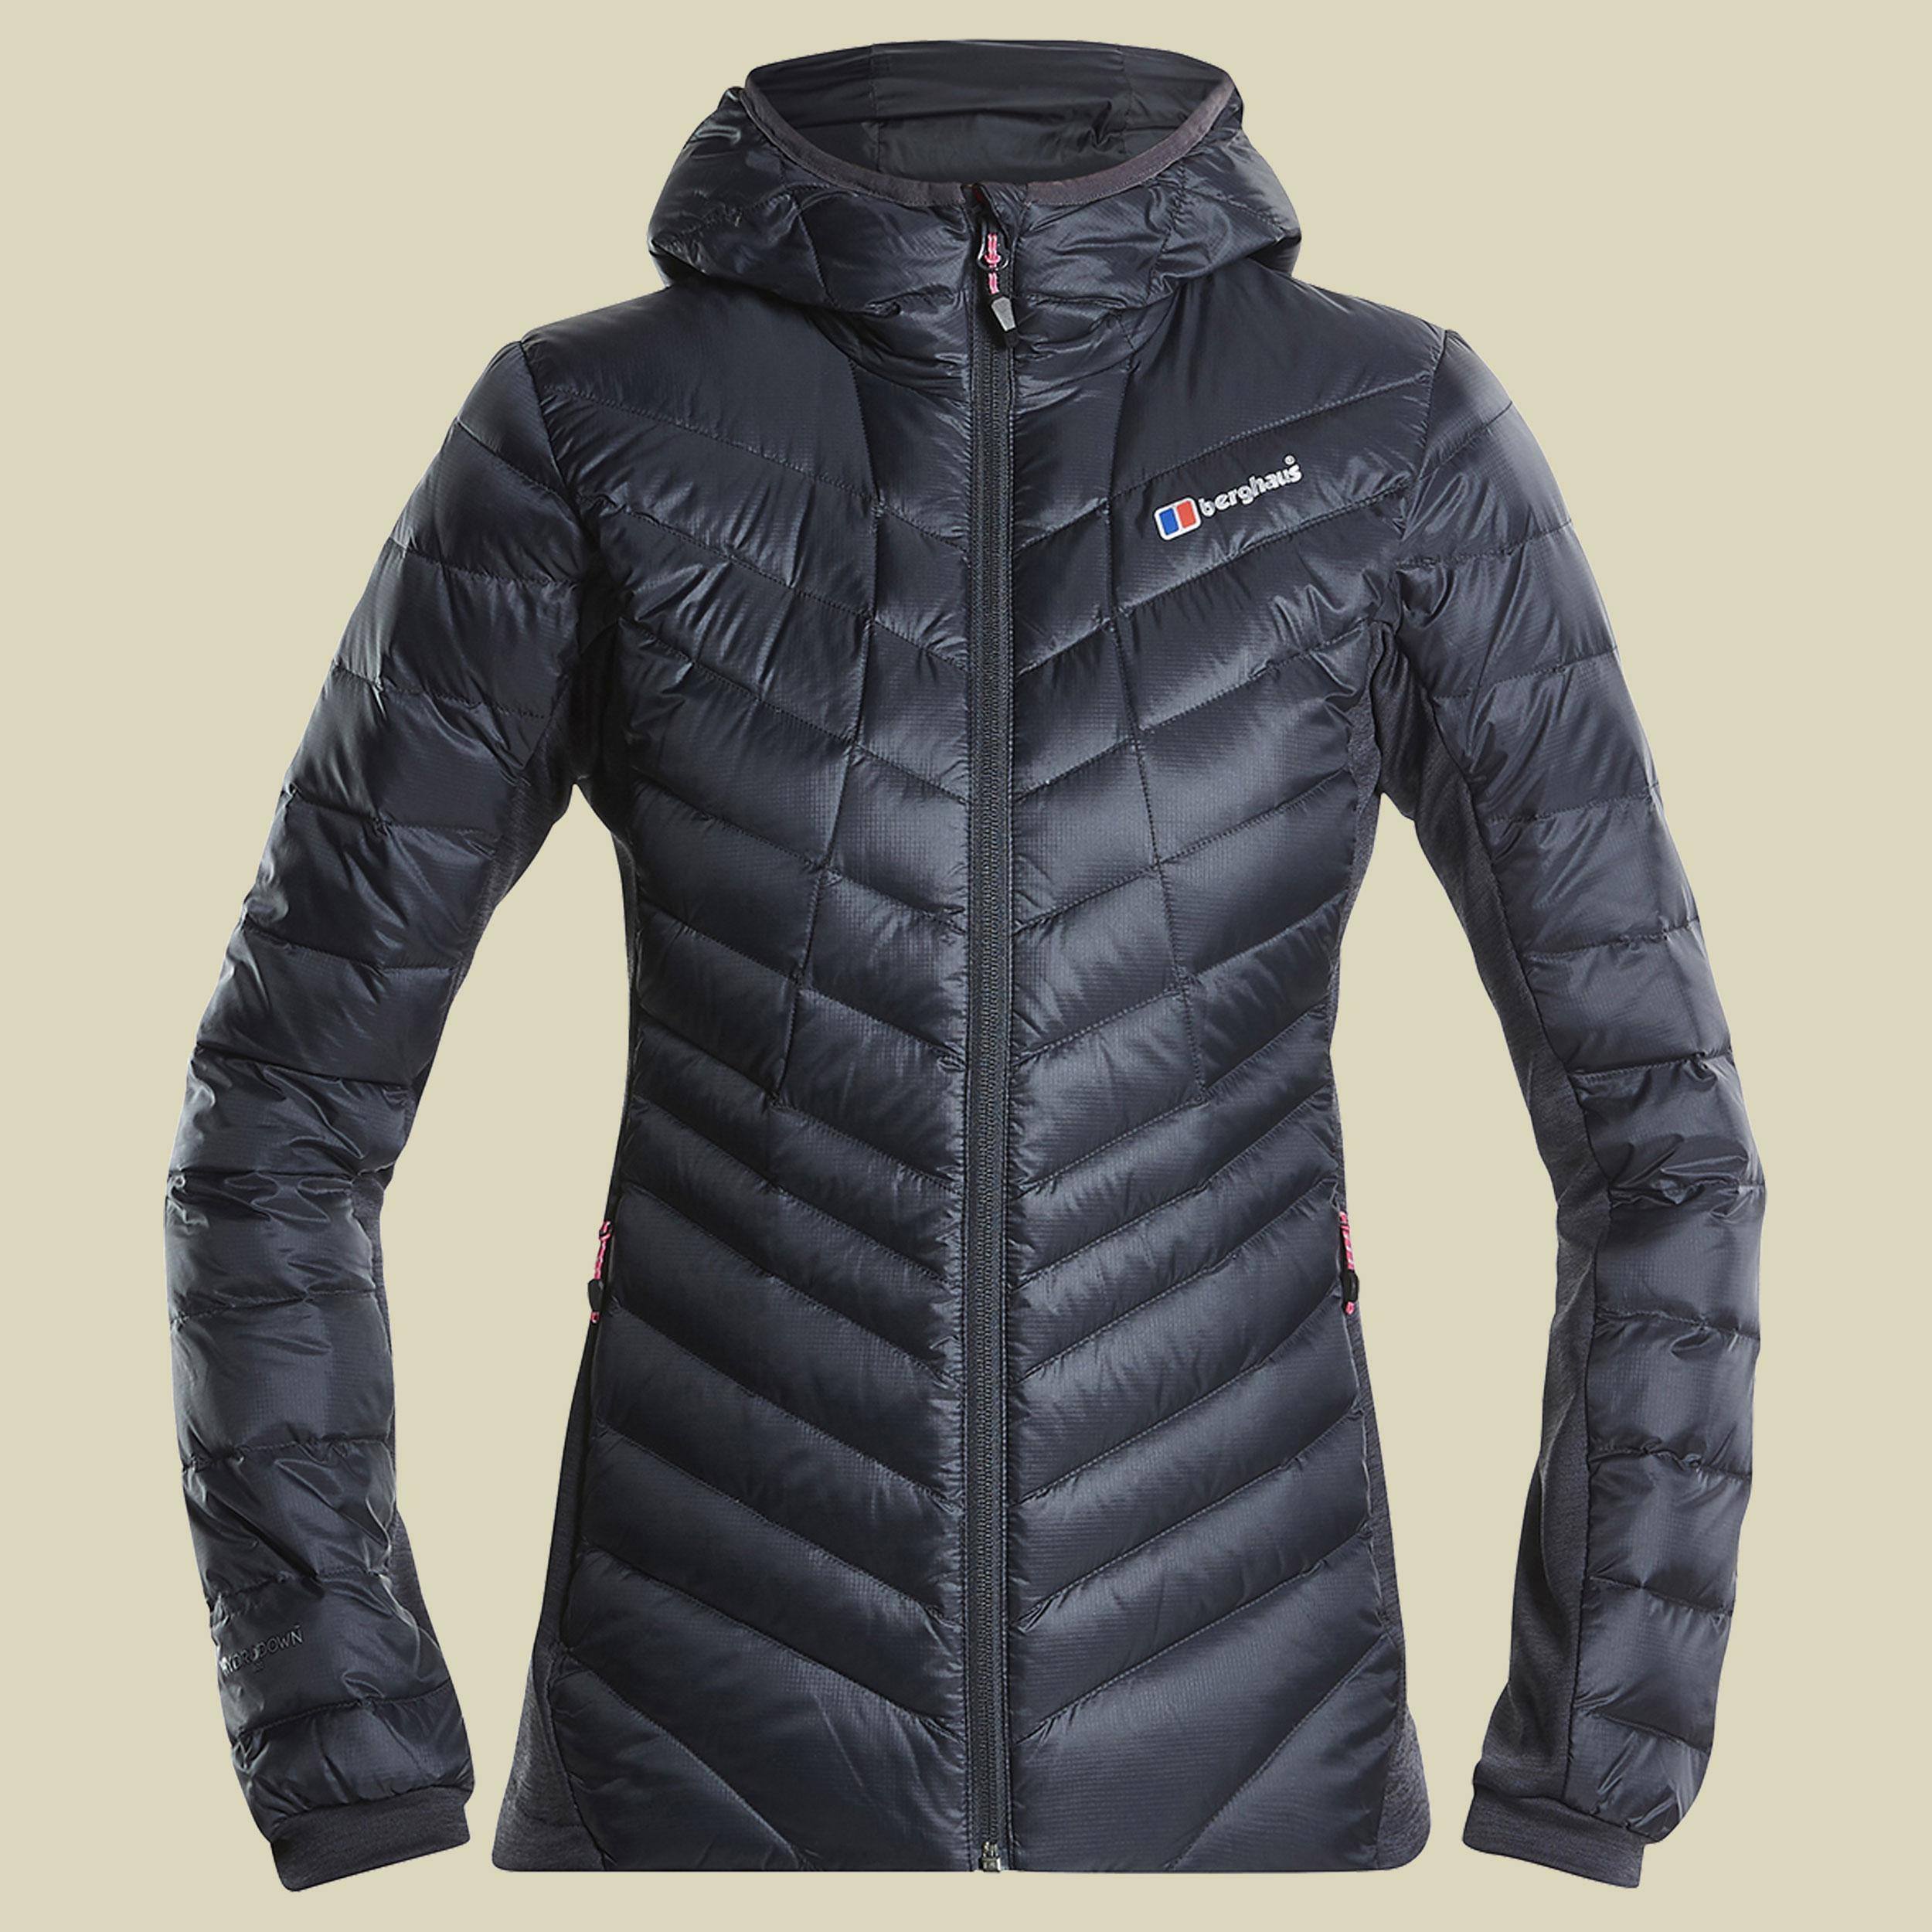 Berghaus Limited Tephra Stretch Jacket Women Damen Daunenjacke Größe 36 (10) carbon